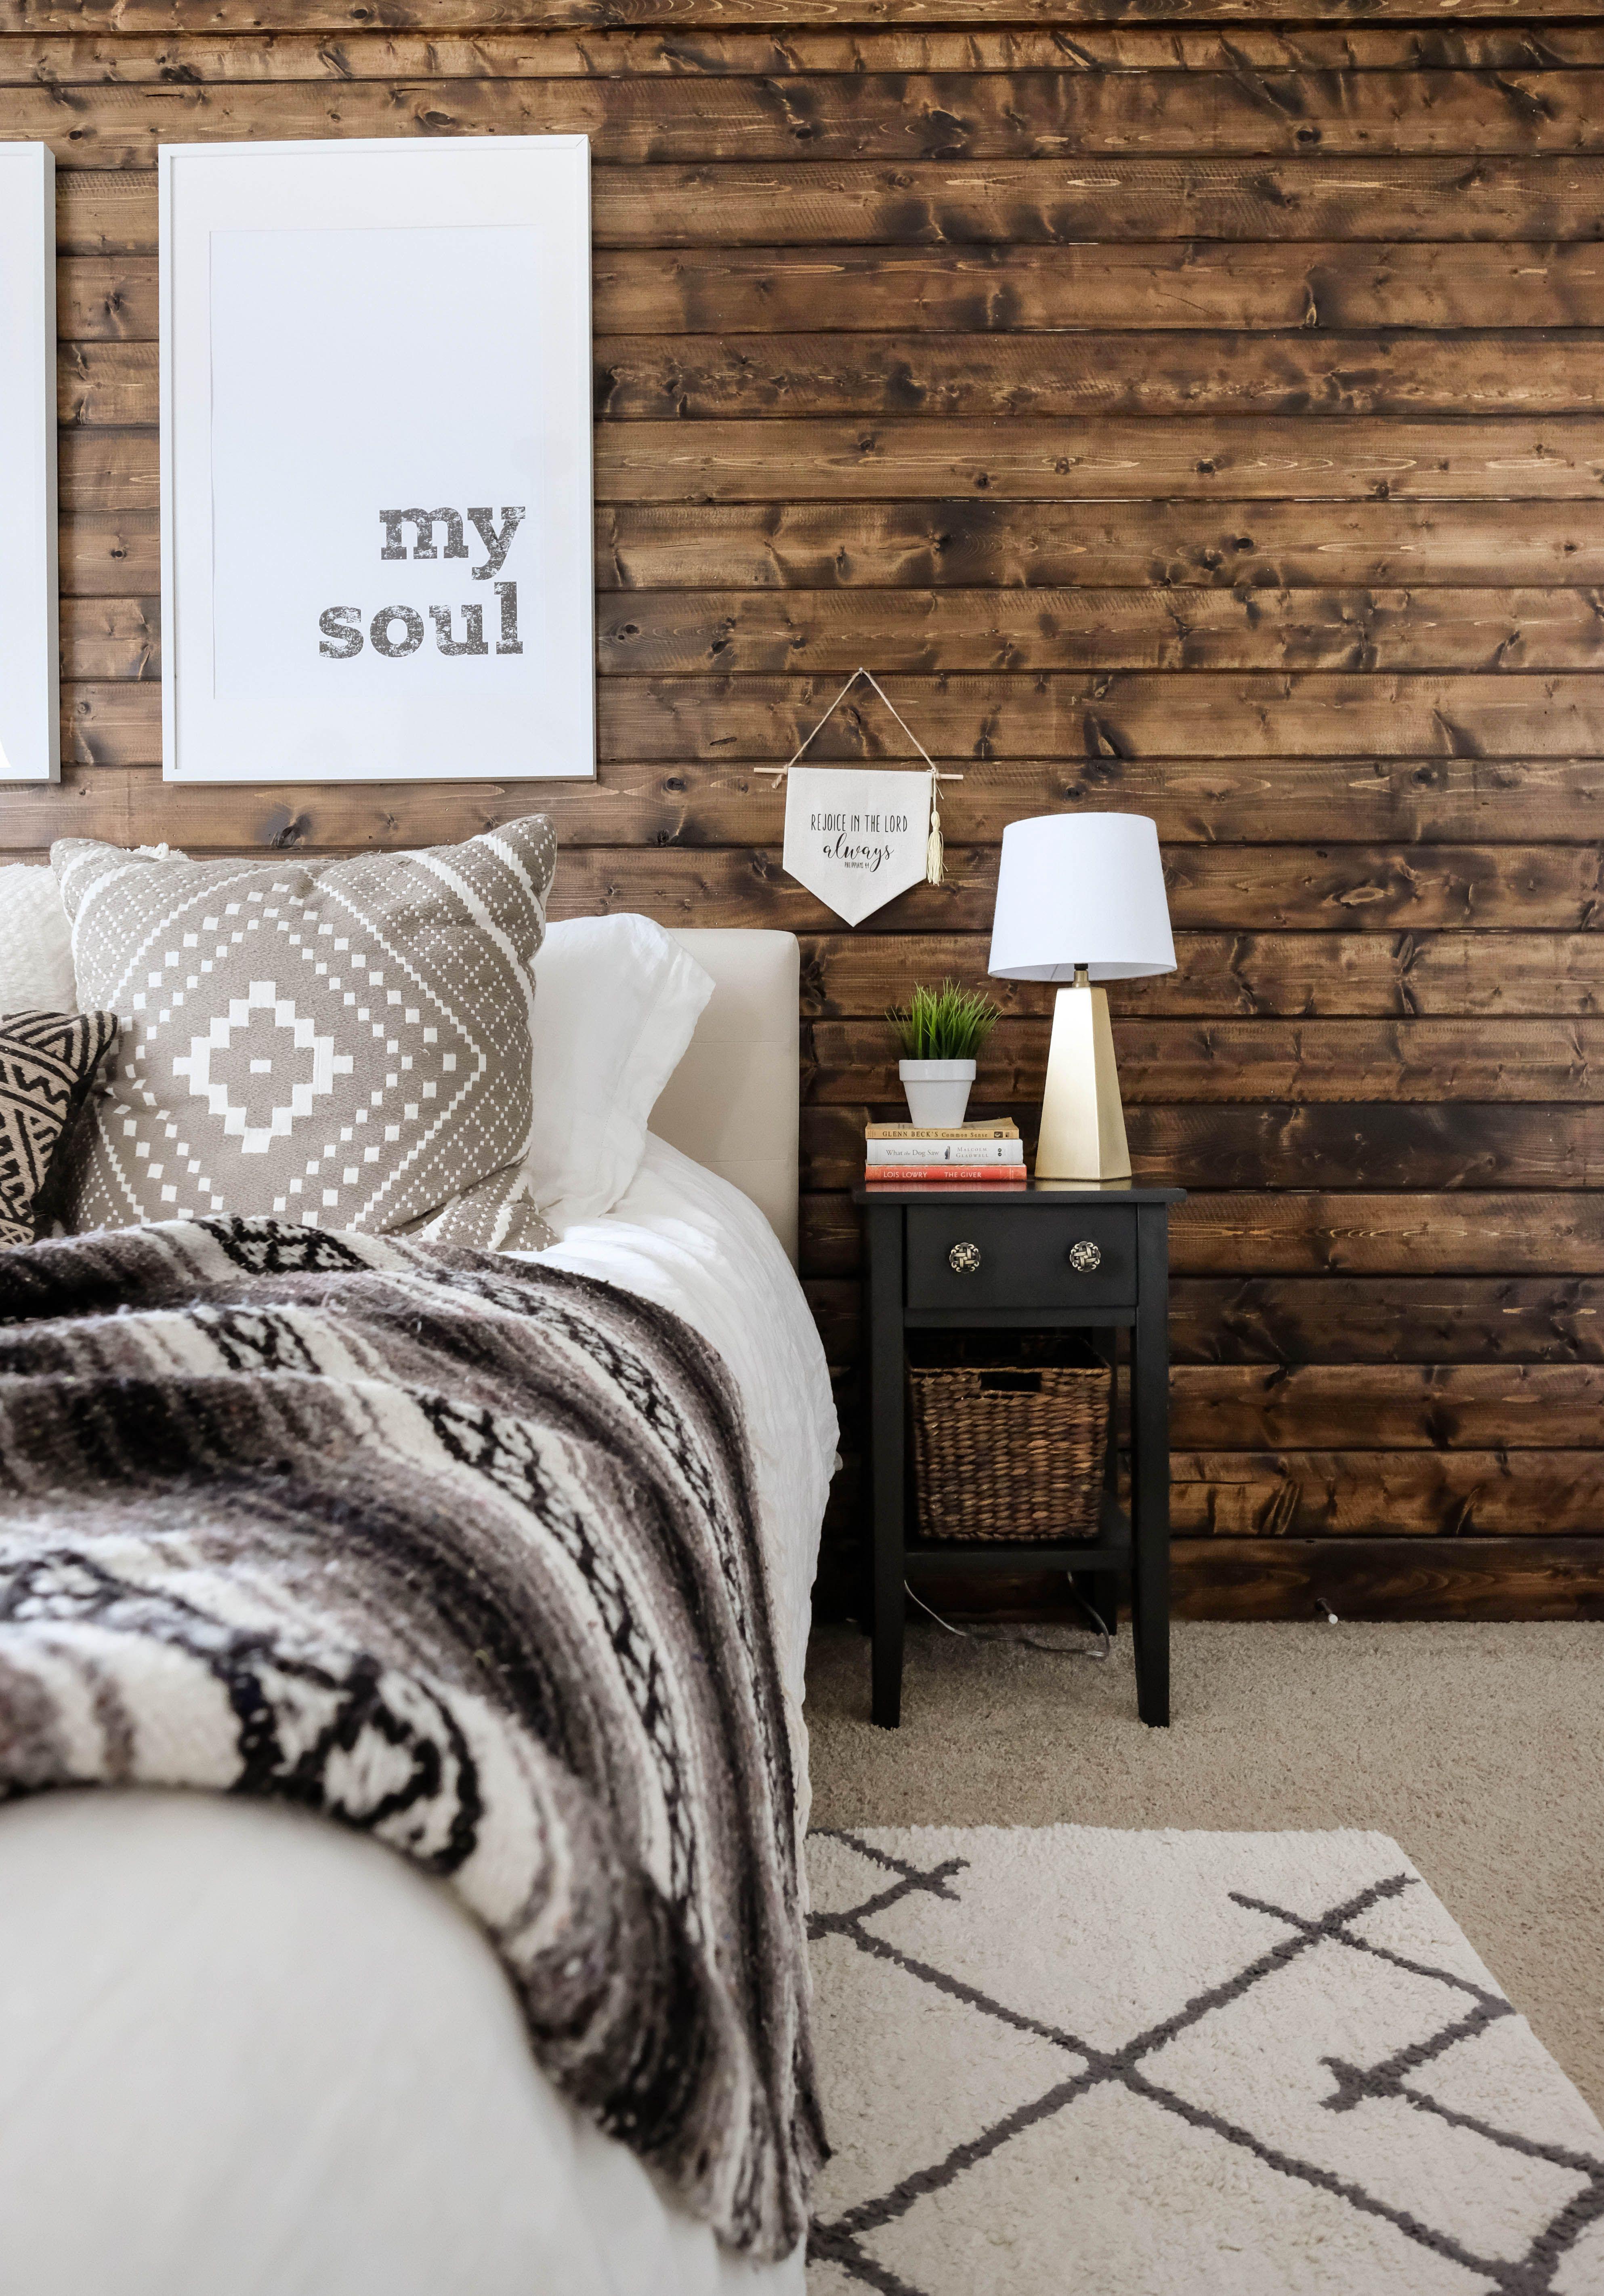 Modern Rustic Bedroom Reveal + Tips on Blending Two Styles ...